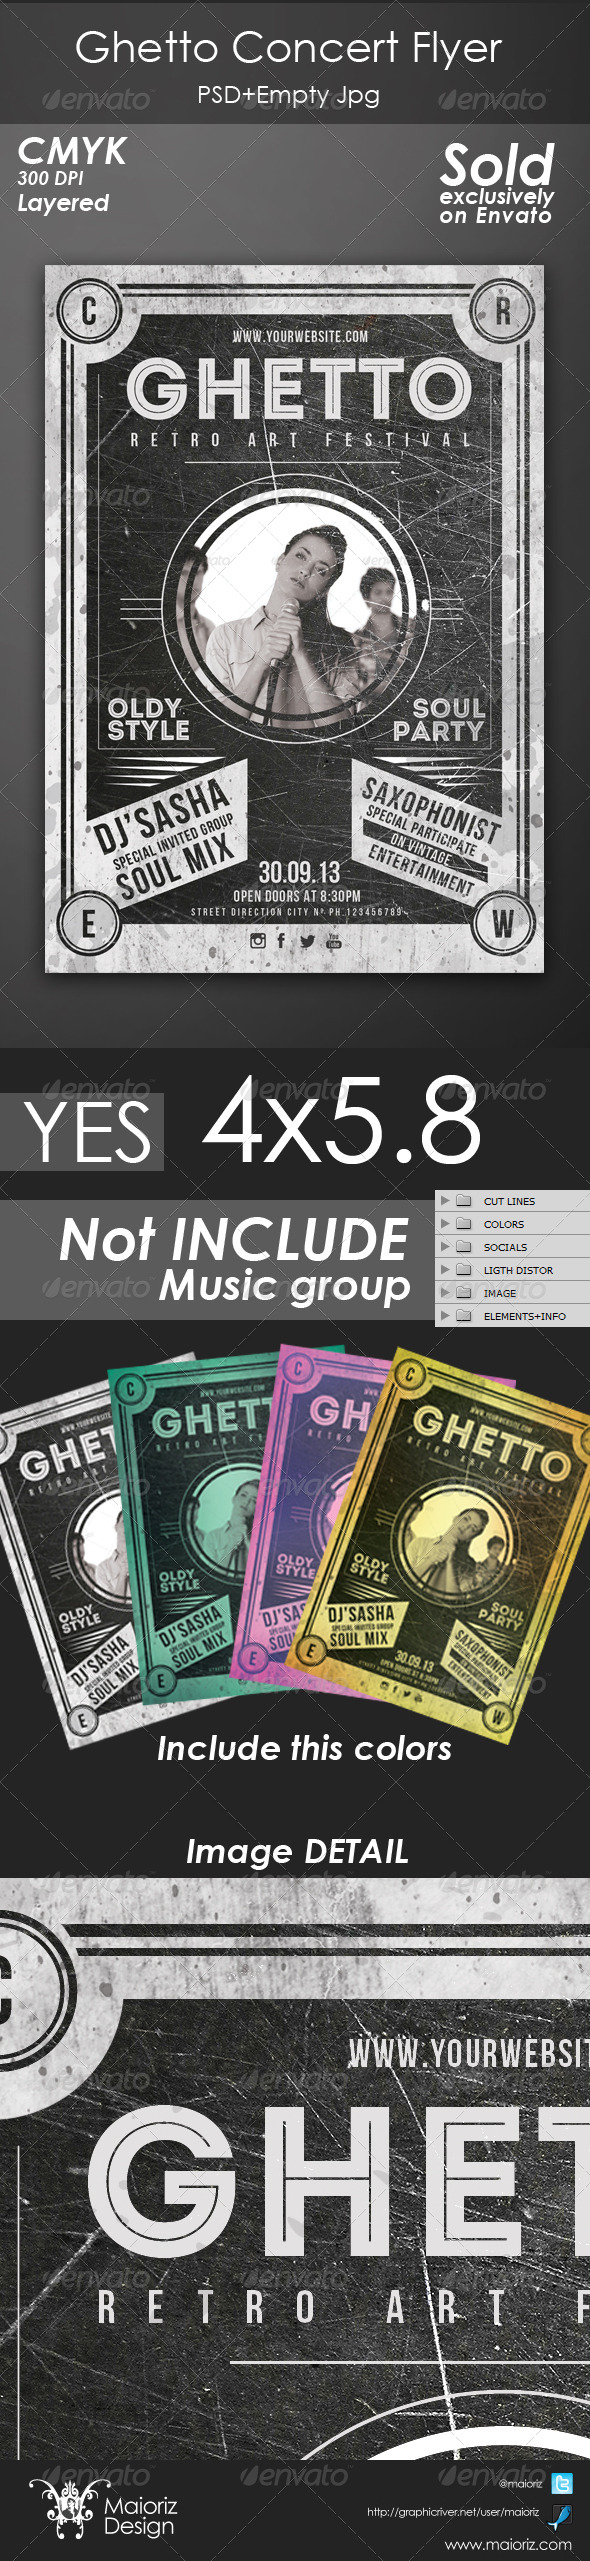 GraphicRiver Ghetto Concert Flyer 4716315